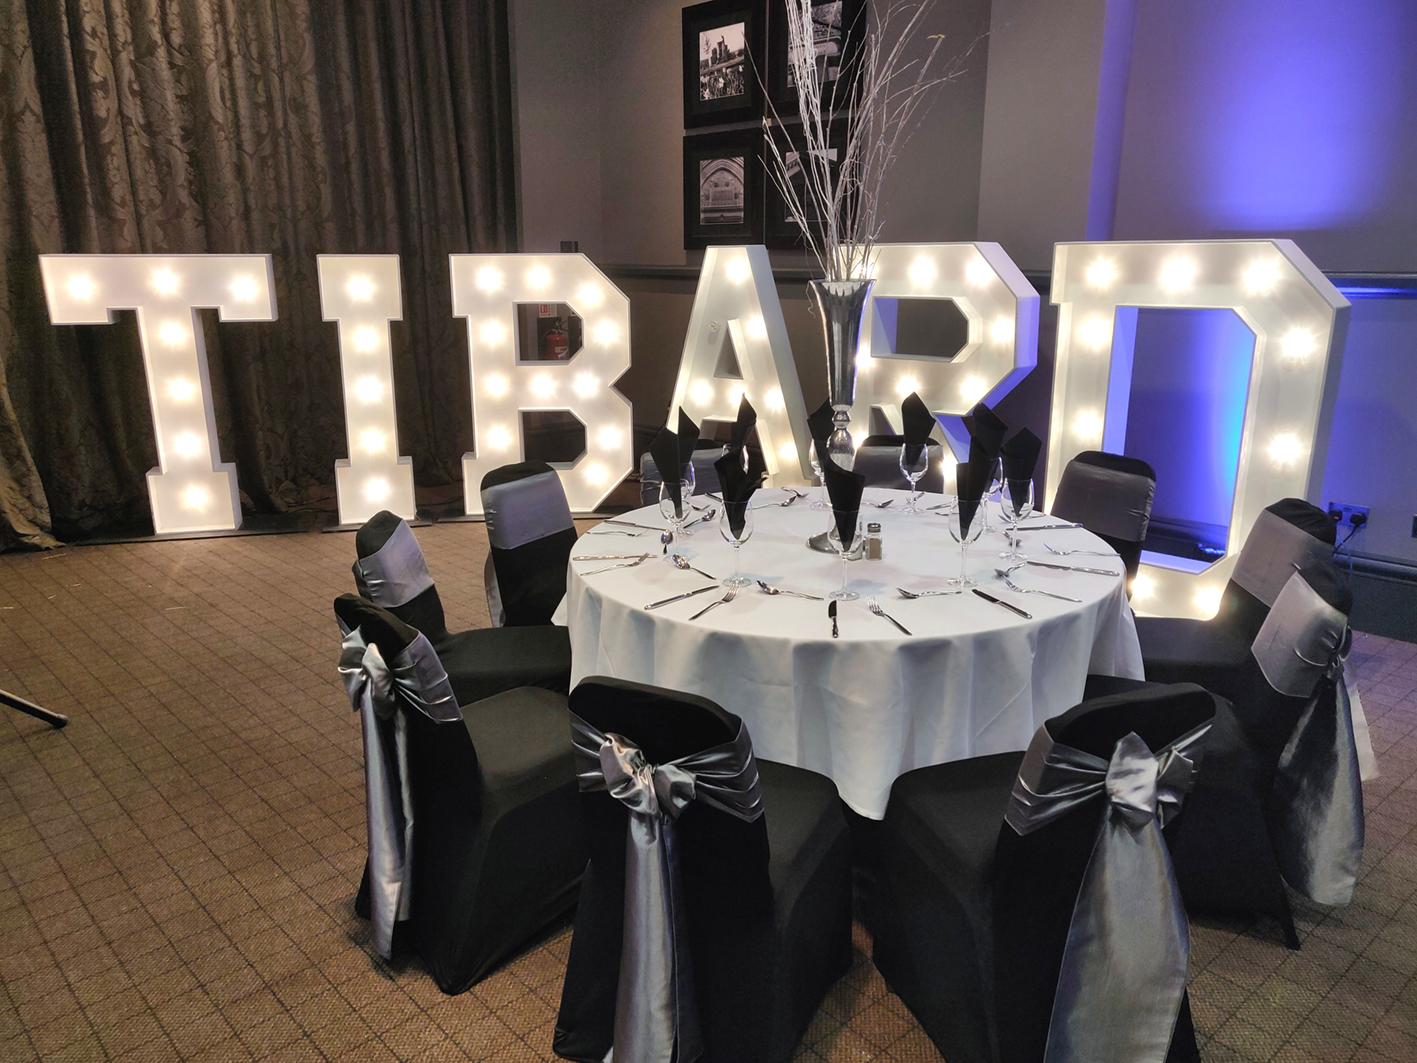 Tibard Celebrates its 40th Anniversary at the Village Hotel, Ashton